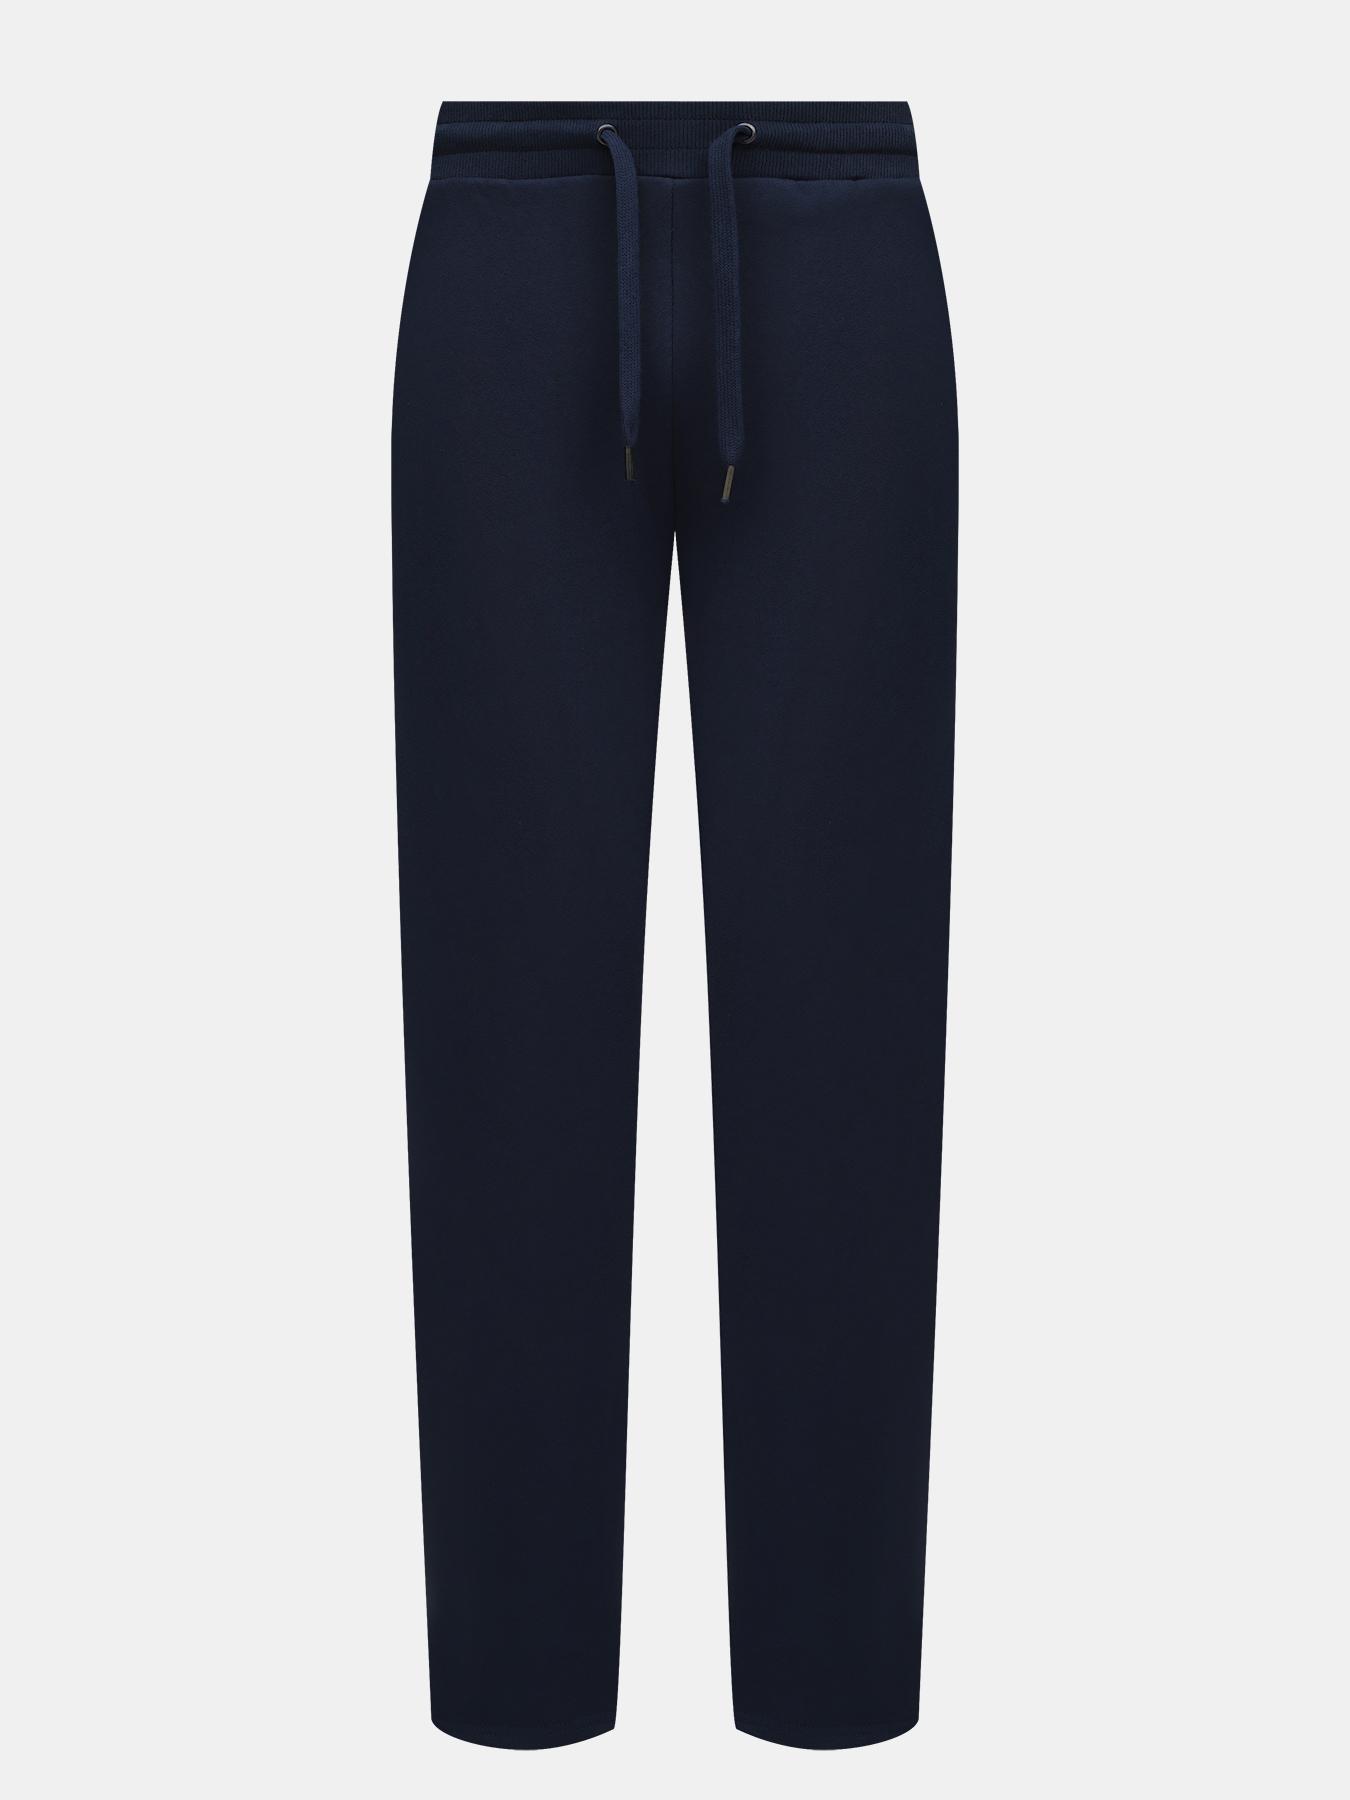 Спортивные брюки Ritter Jeans Брюки брюки ritter jeans мужские брюки